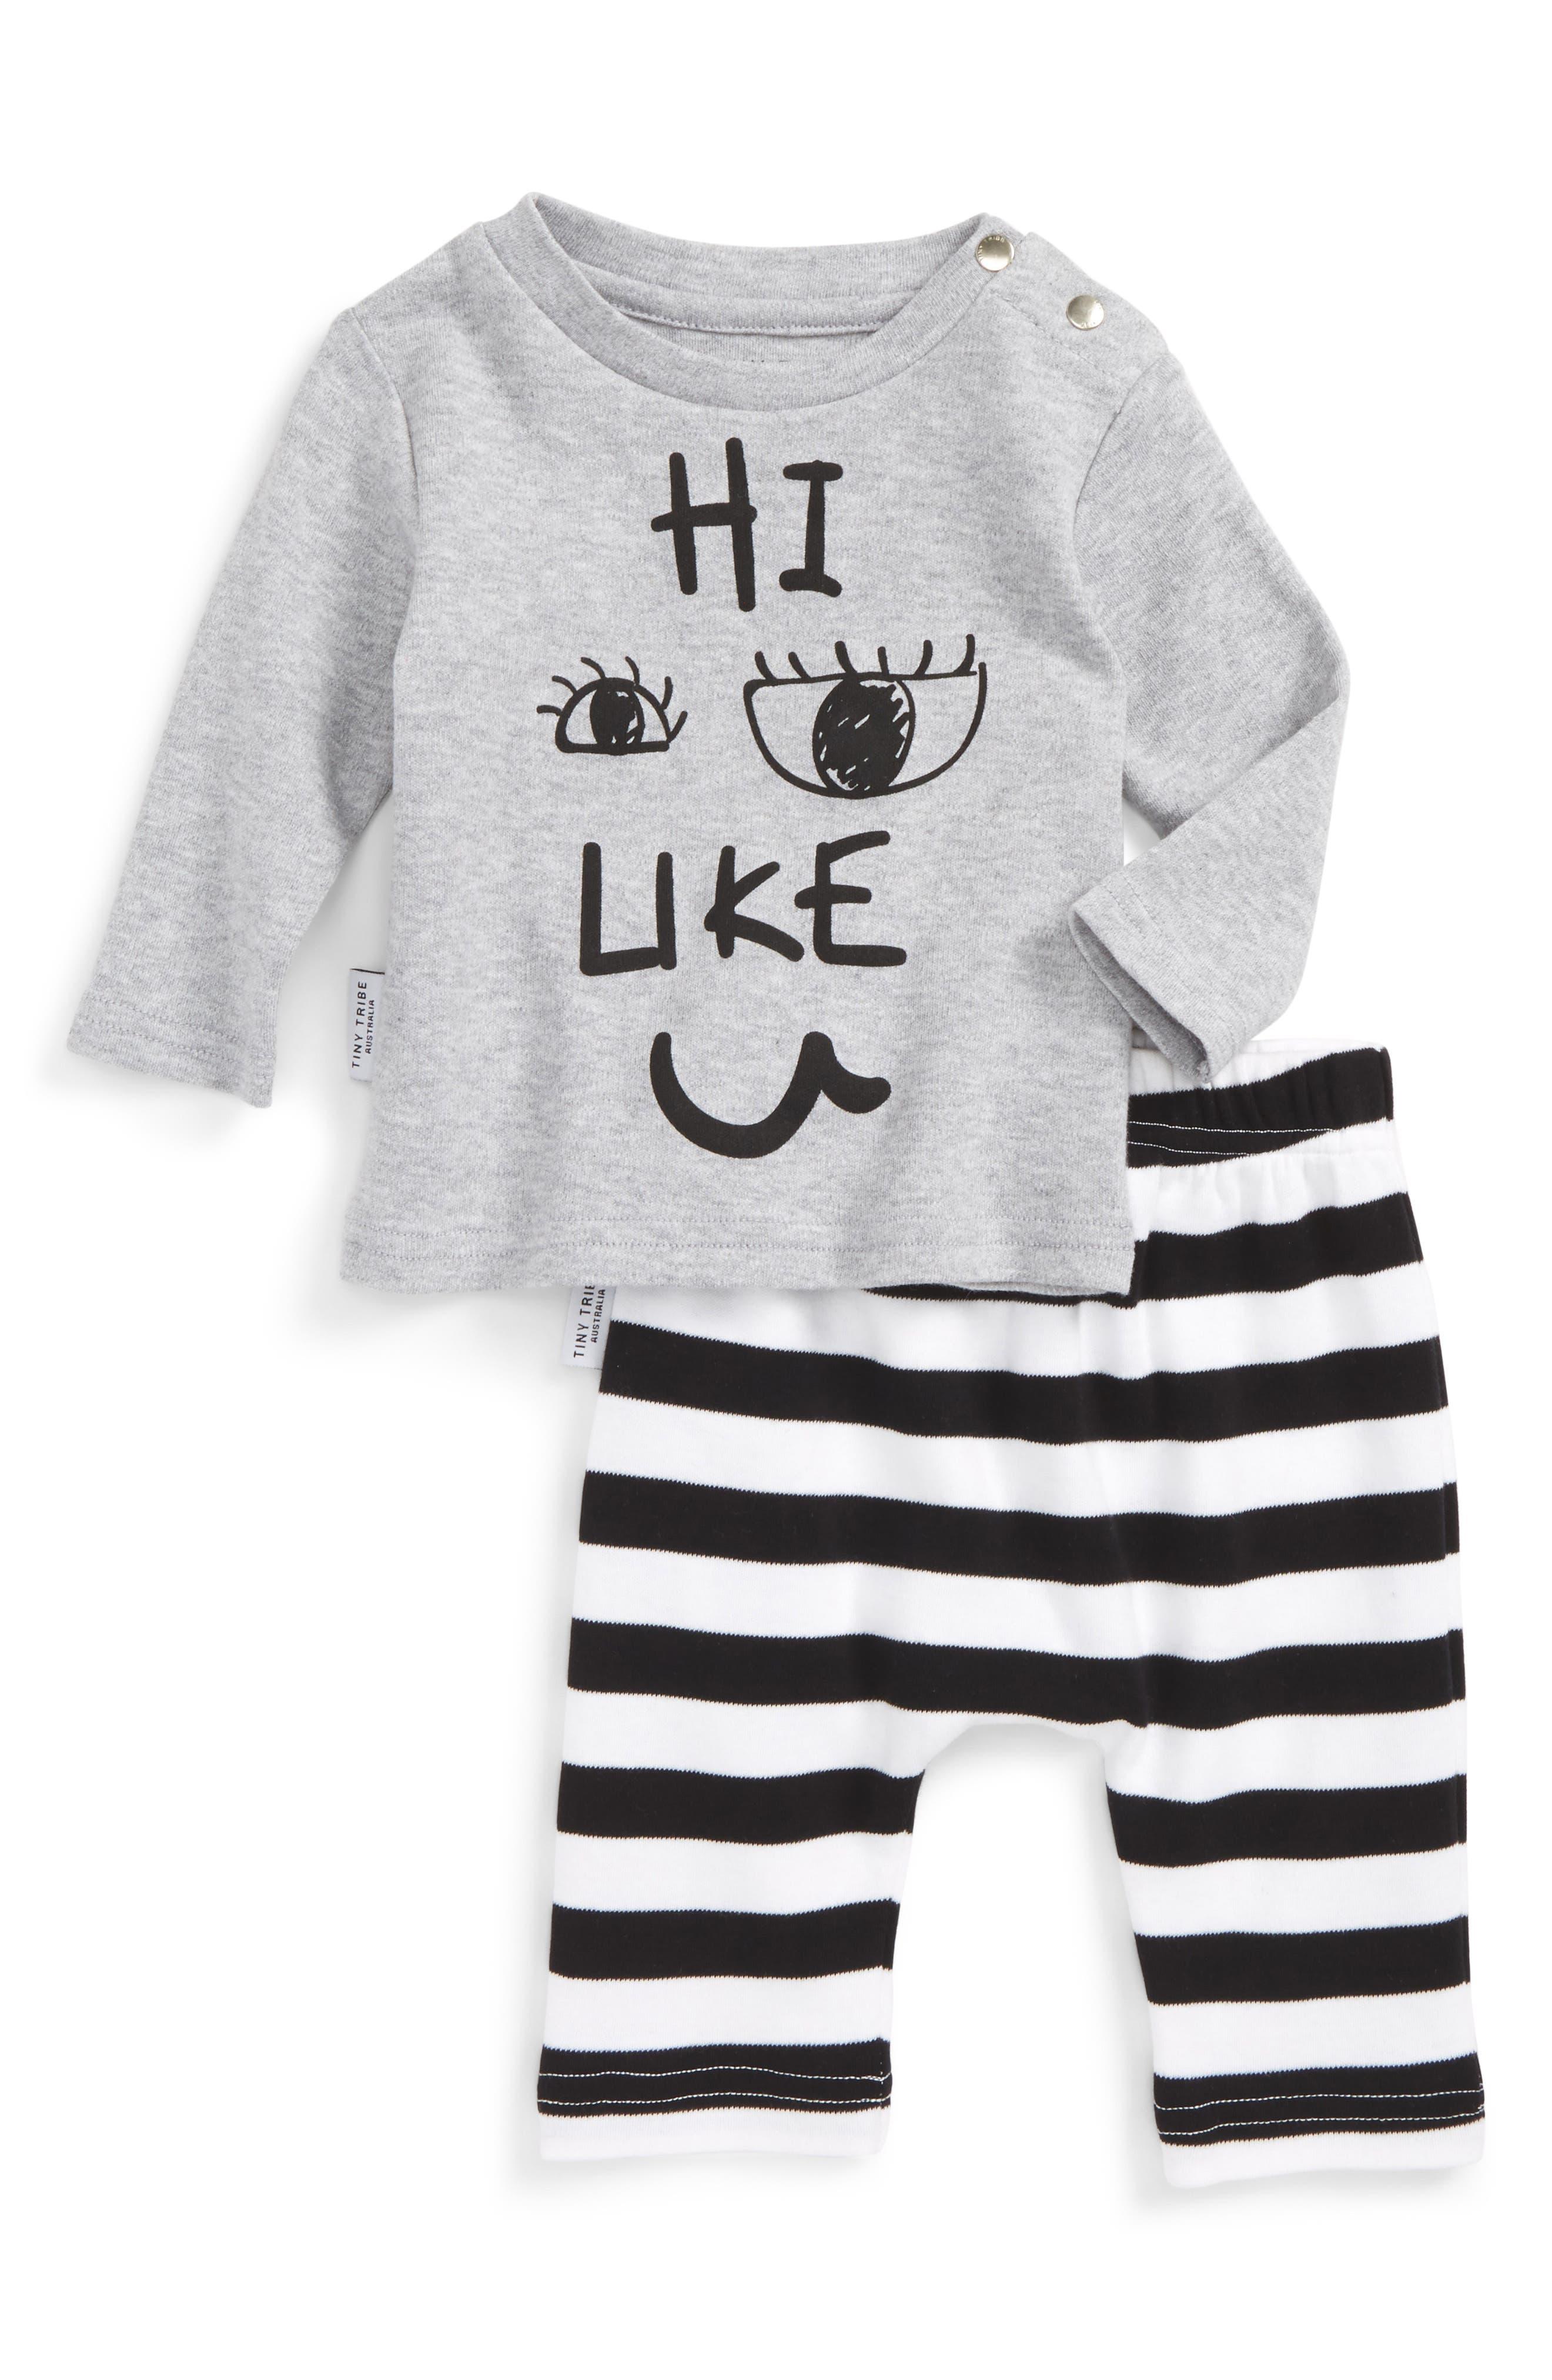 Alternate Image 1 Selected - Tiny Tribe Hi, I Like You Tee & Leggings Set (Baby & Toddler)